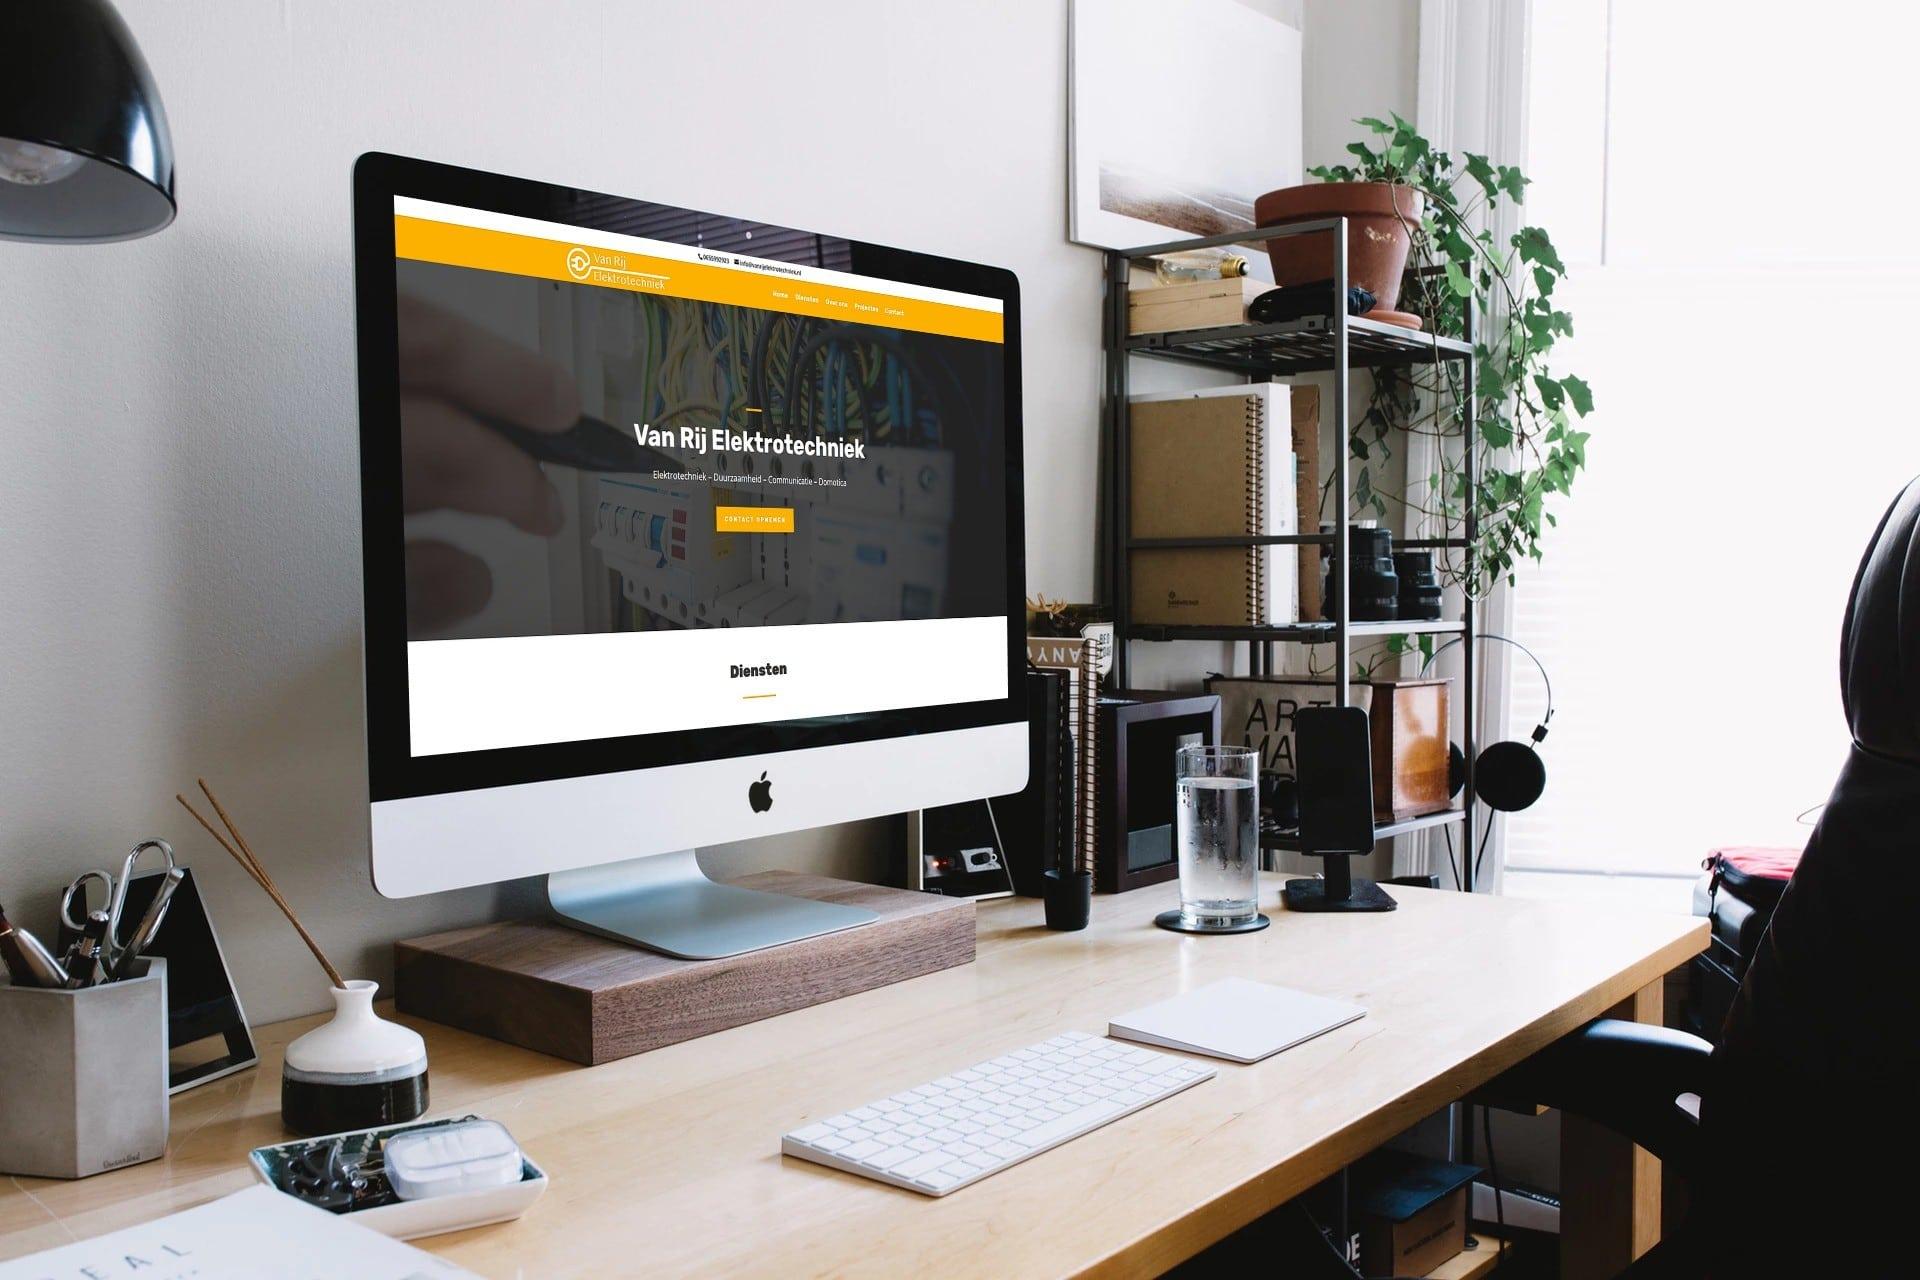 Nieuwe website van Van Rij Elektrotechniek